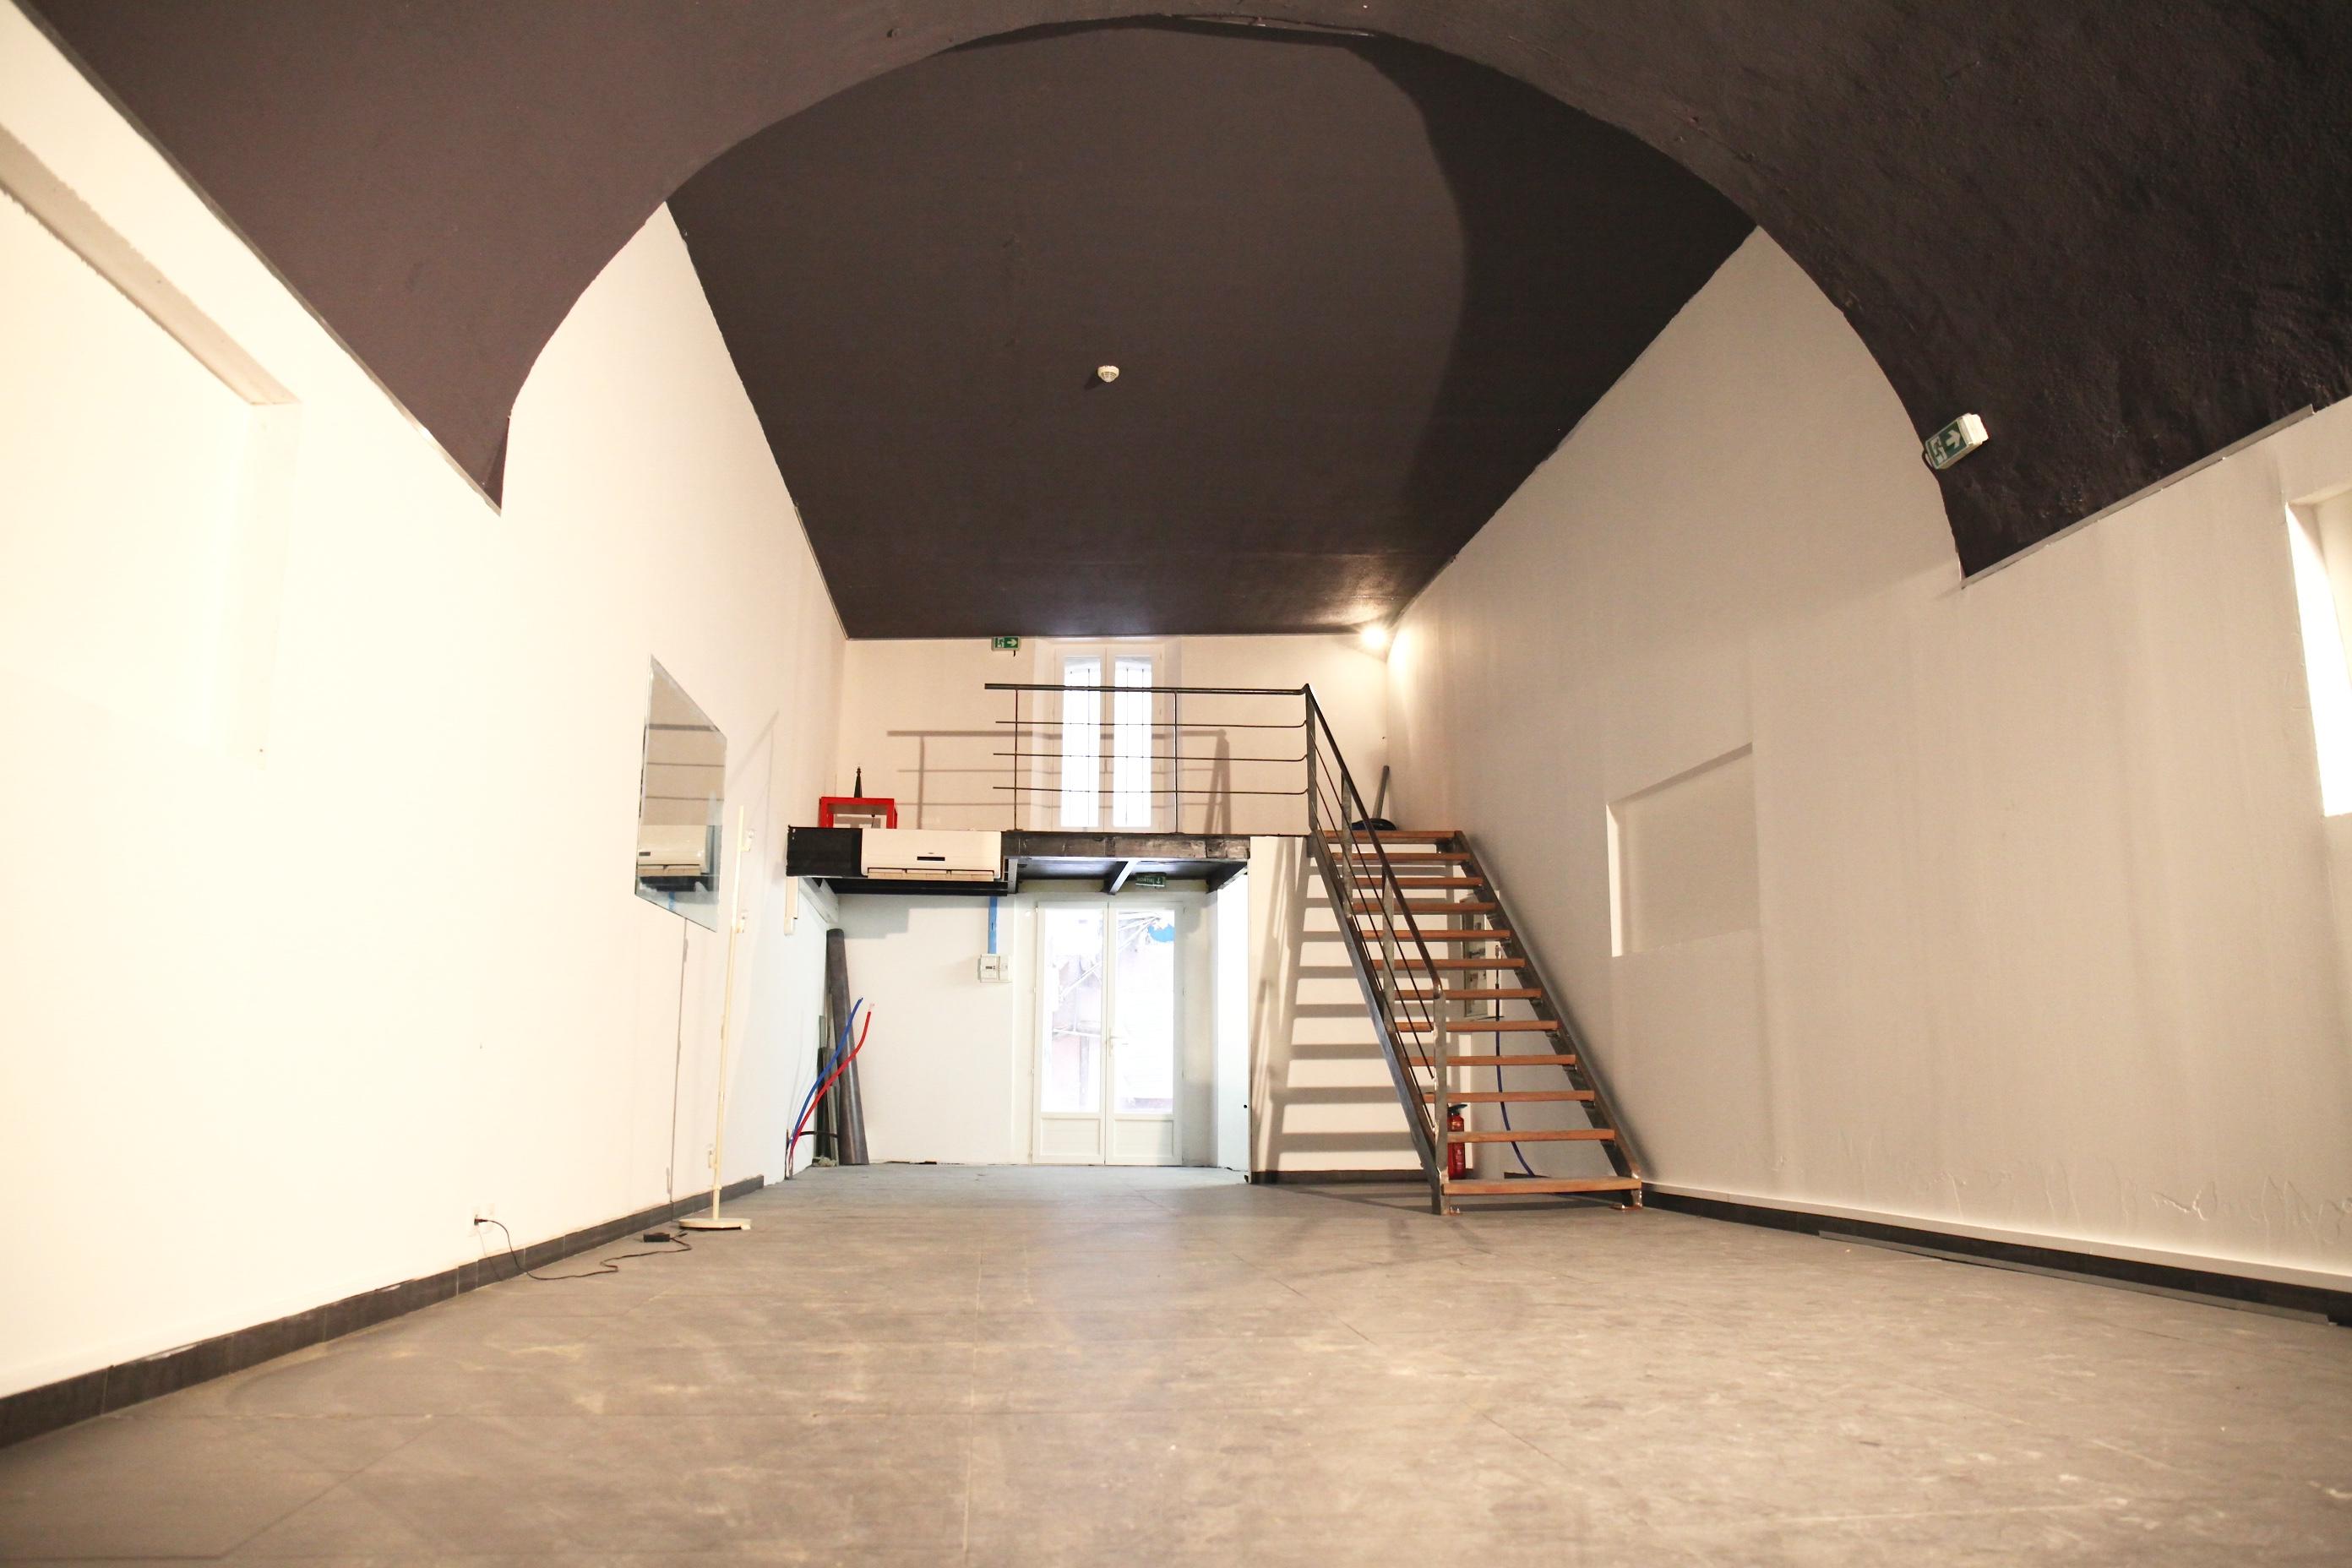 Vendu - 7e - Vieux Port - La Criée - Loft - Local  - 70m² sol -  Local attenant de 15m² - 110 000€